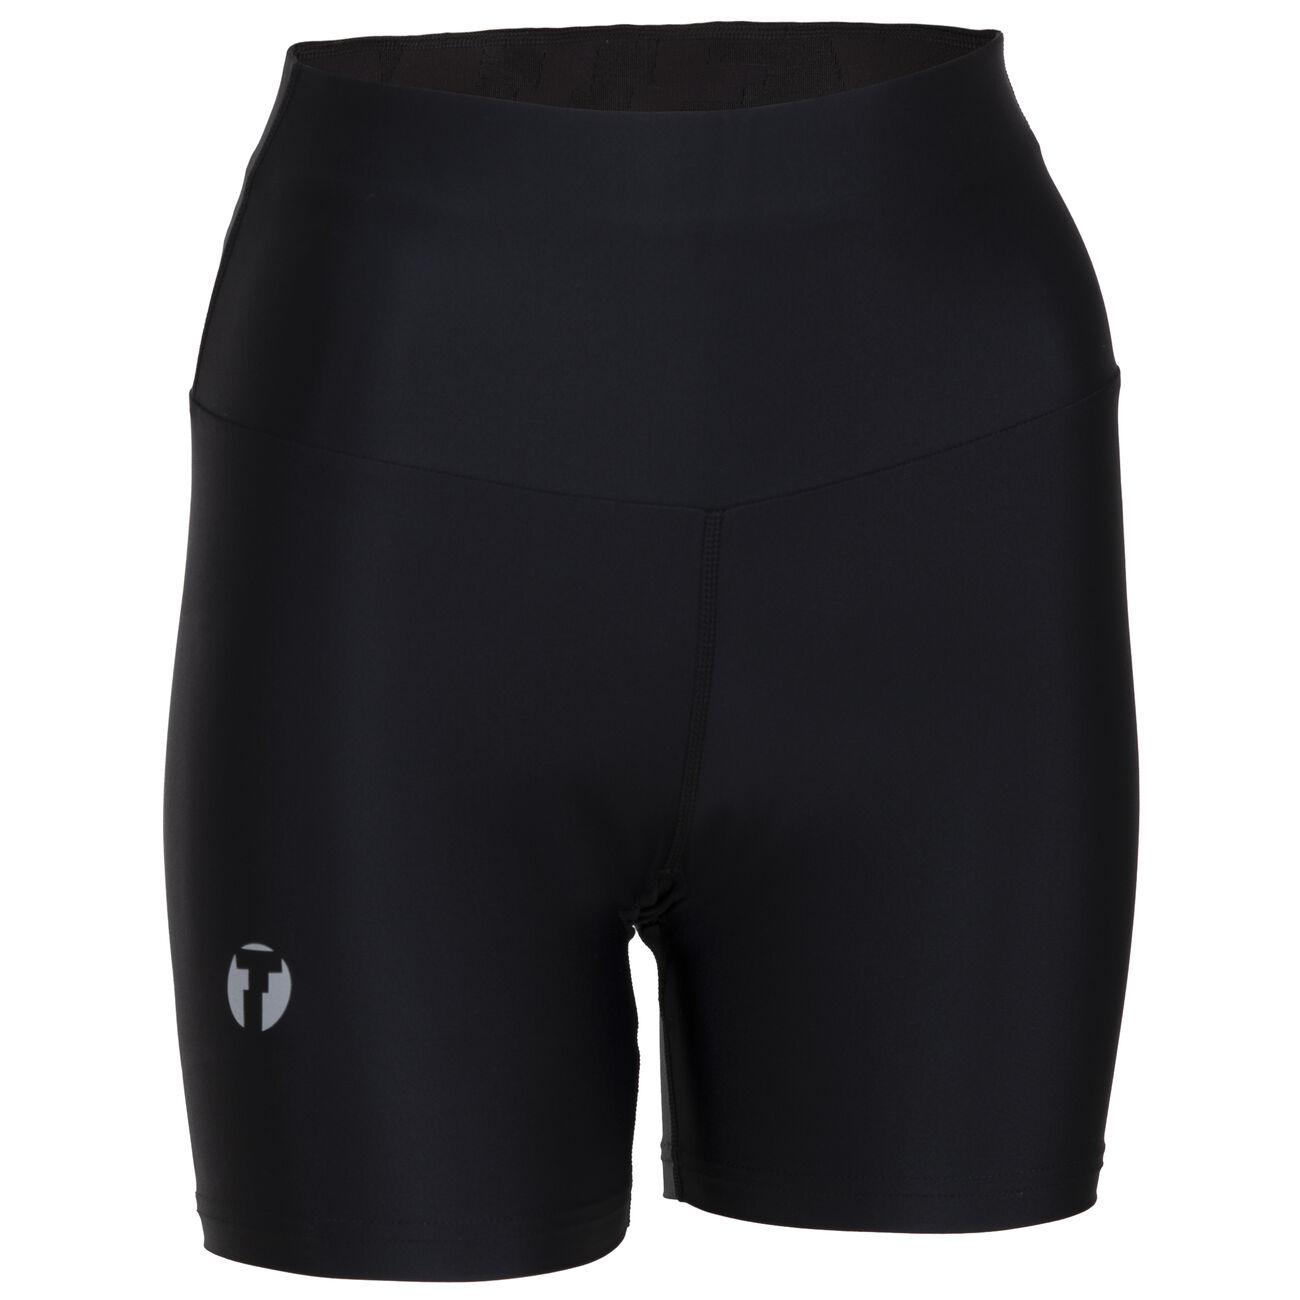 Adapt short tights women's